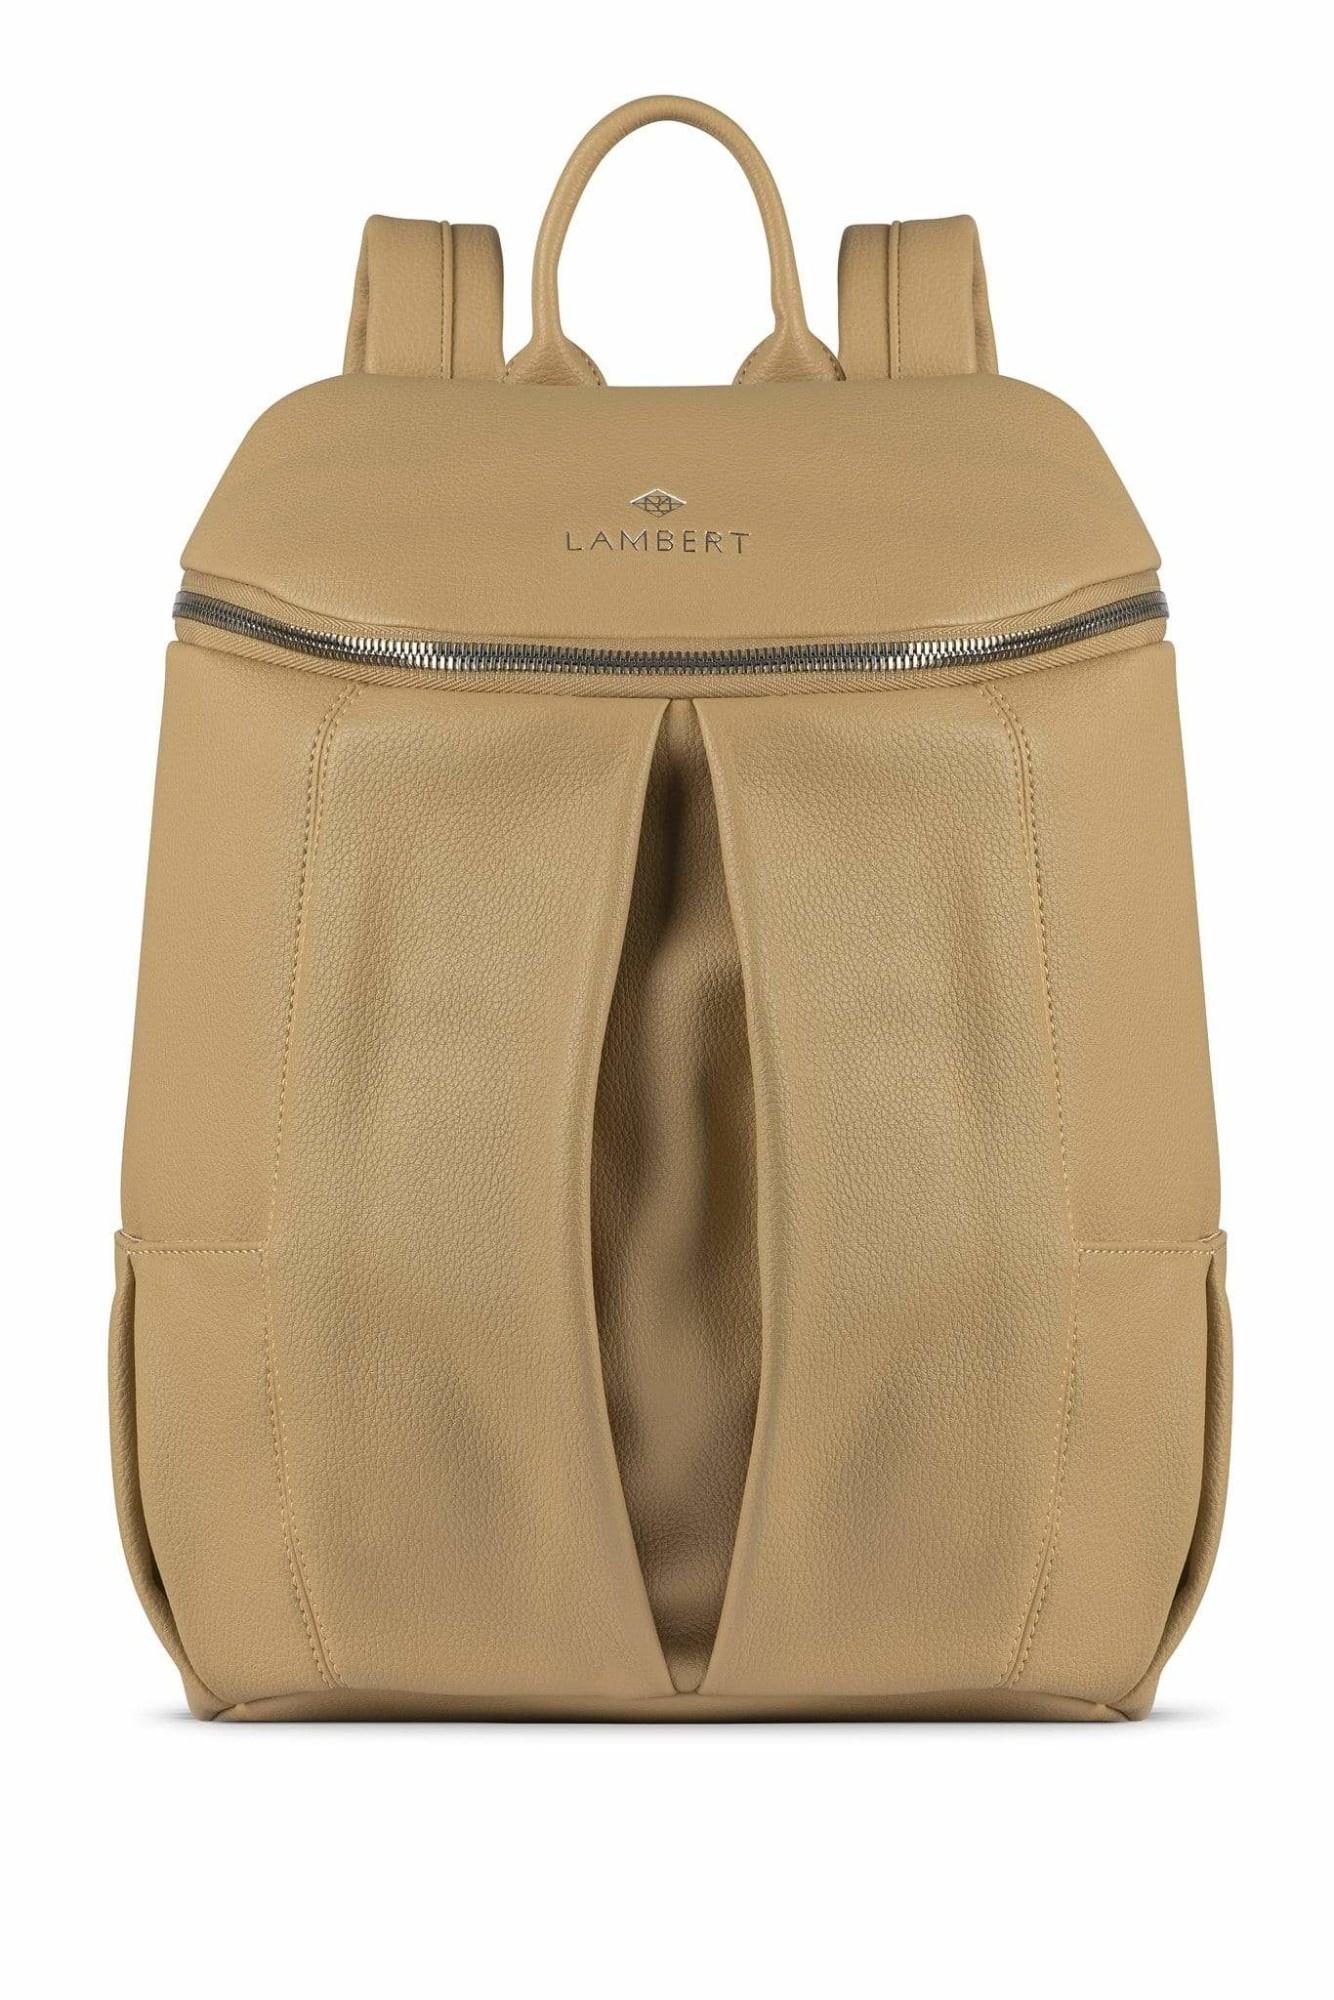 Lambert SARA - Sac à dos en cuir vegan sand pour femme